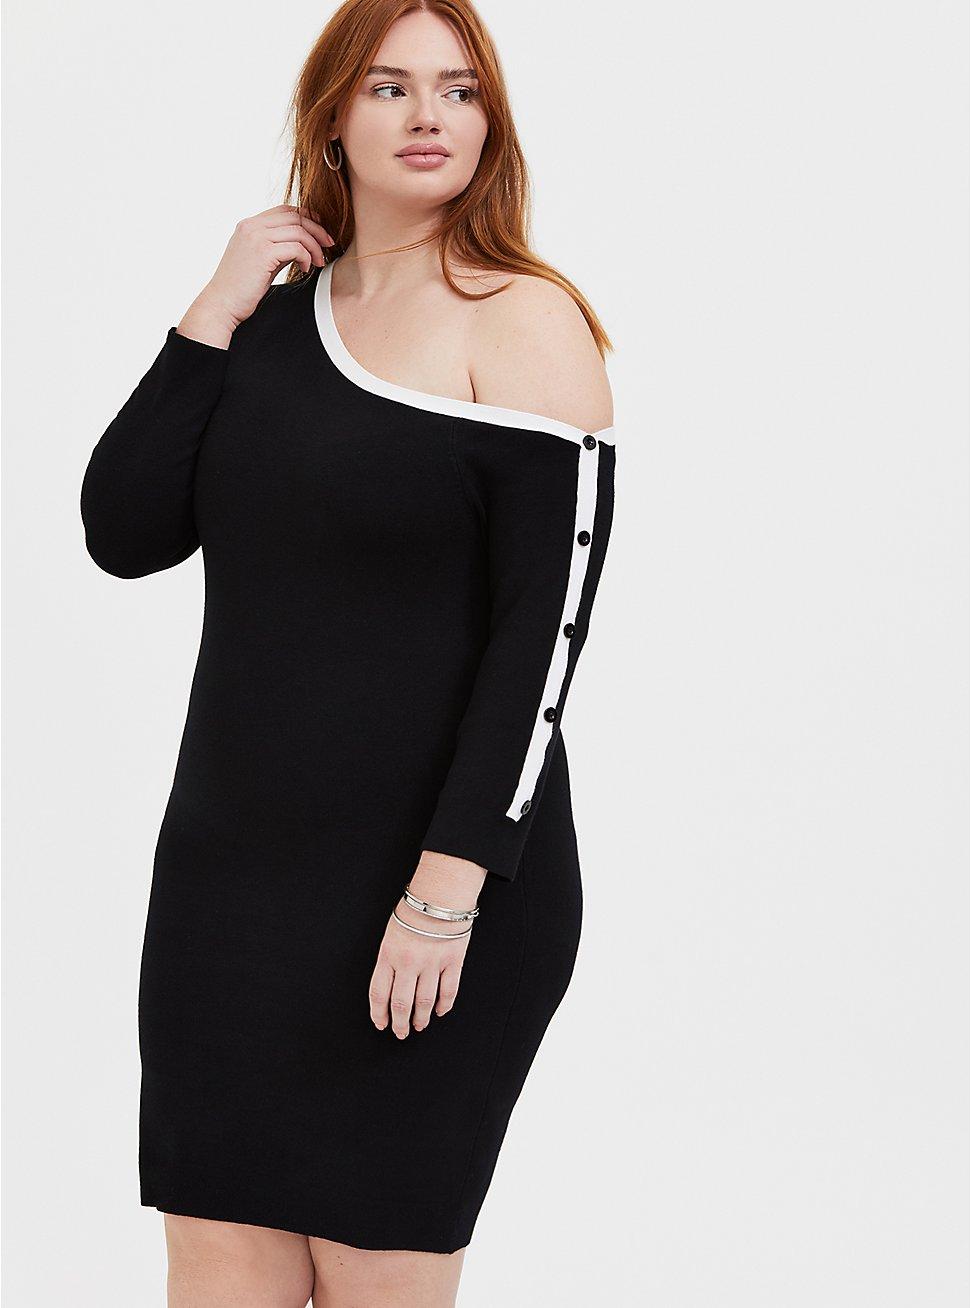 Plus Size Black & White Off Shoulder Button Sleeve Dress, DEEP BLACK, hi-res